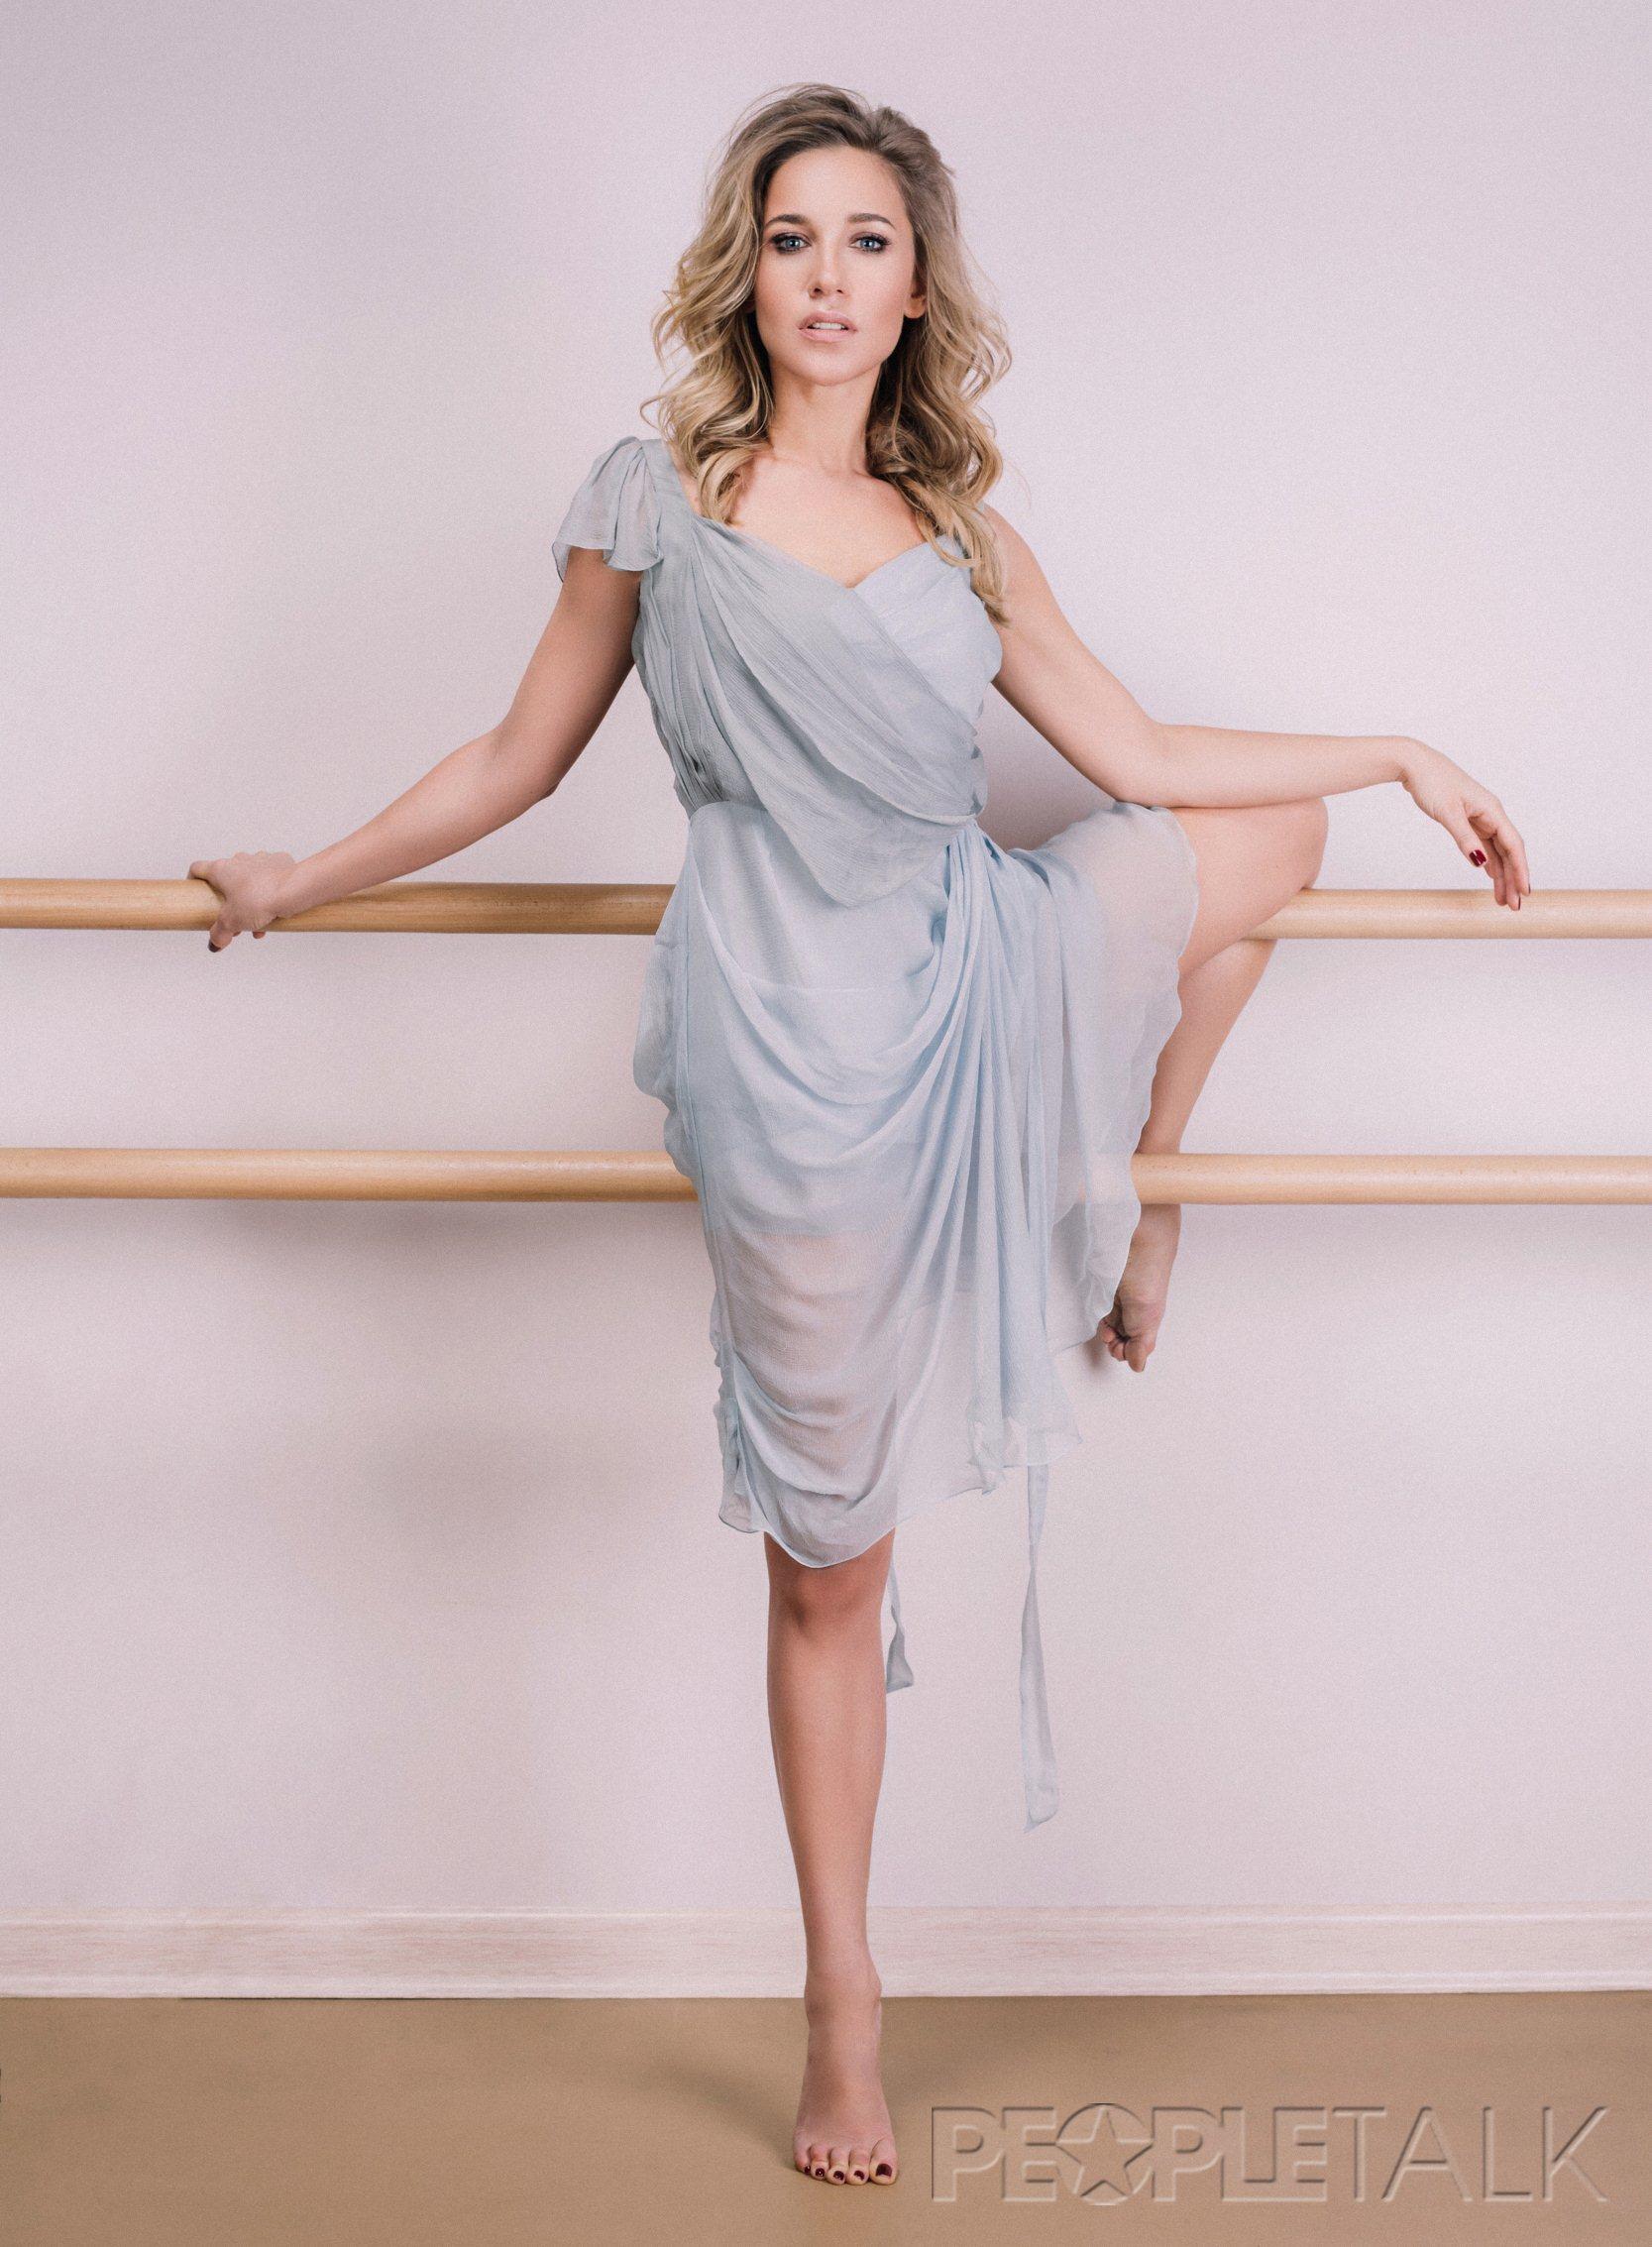 Instagram Feet Julia Kovalchuk naked photo 2017